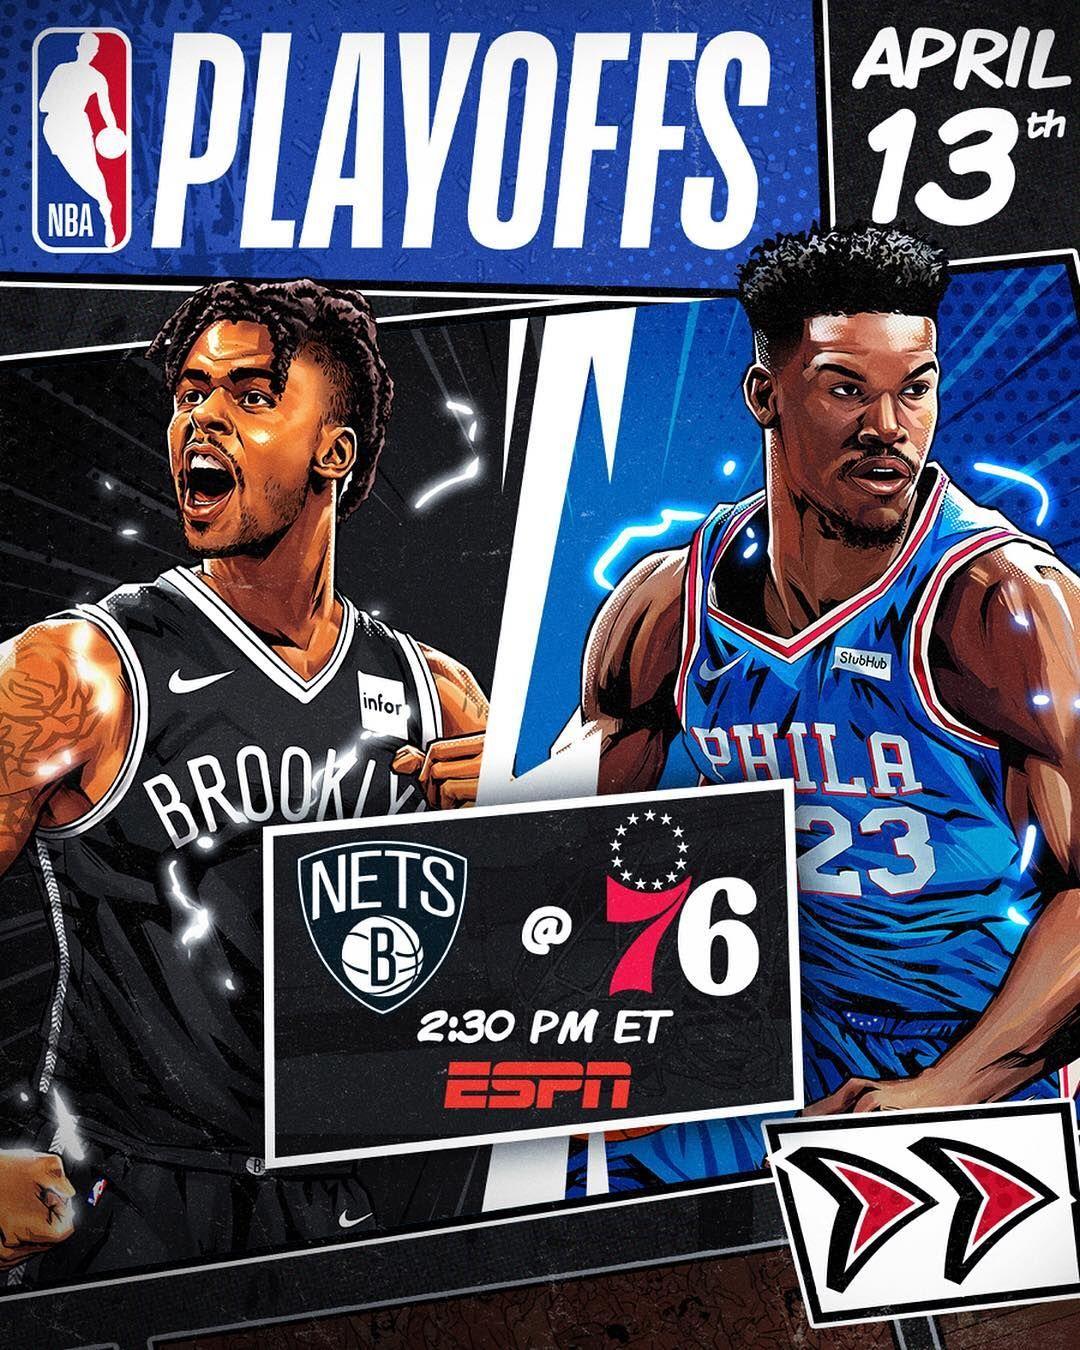 Nba The Nbaplayoffs Story Begins Today On Espn Abc Basketball Big4 Bigfour Big4 Bigfour Nba Basketball Players Nba Sport Poster Design